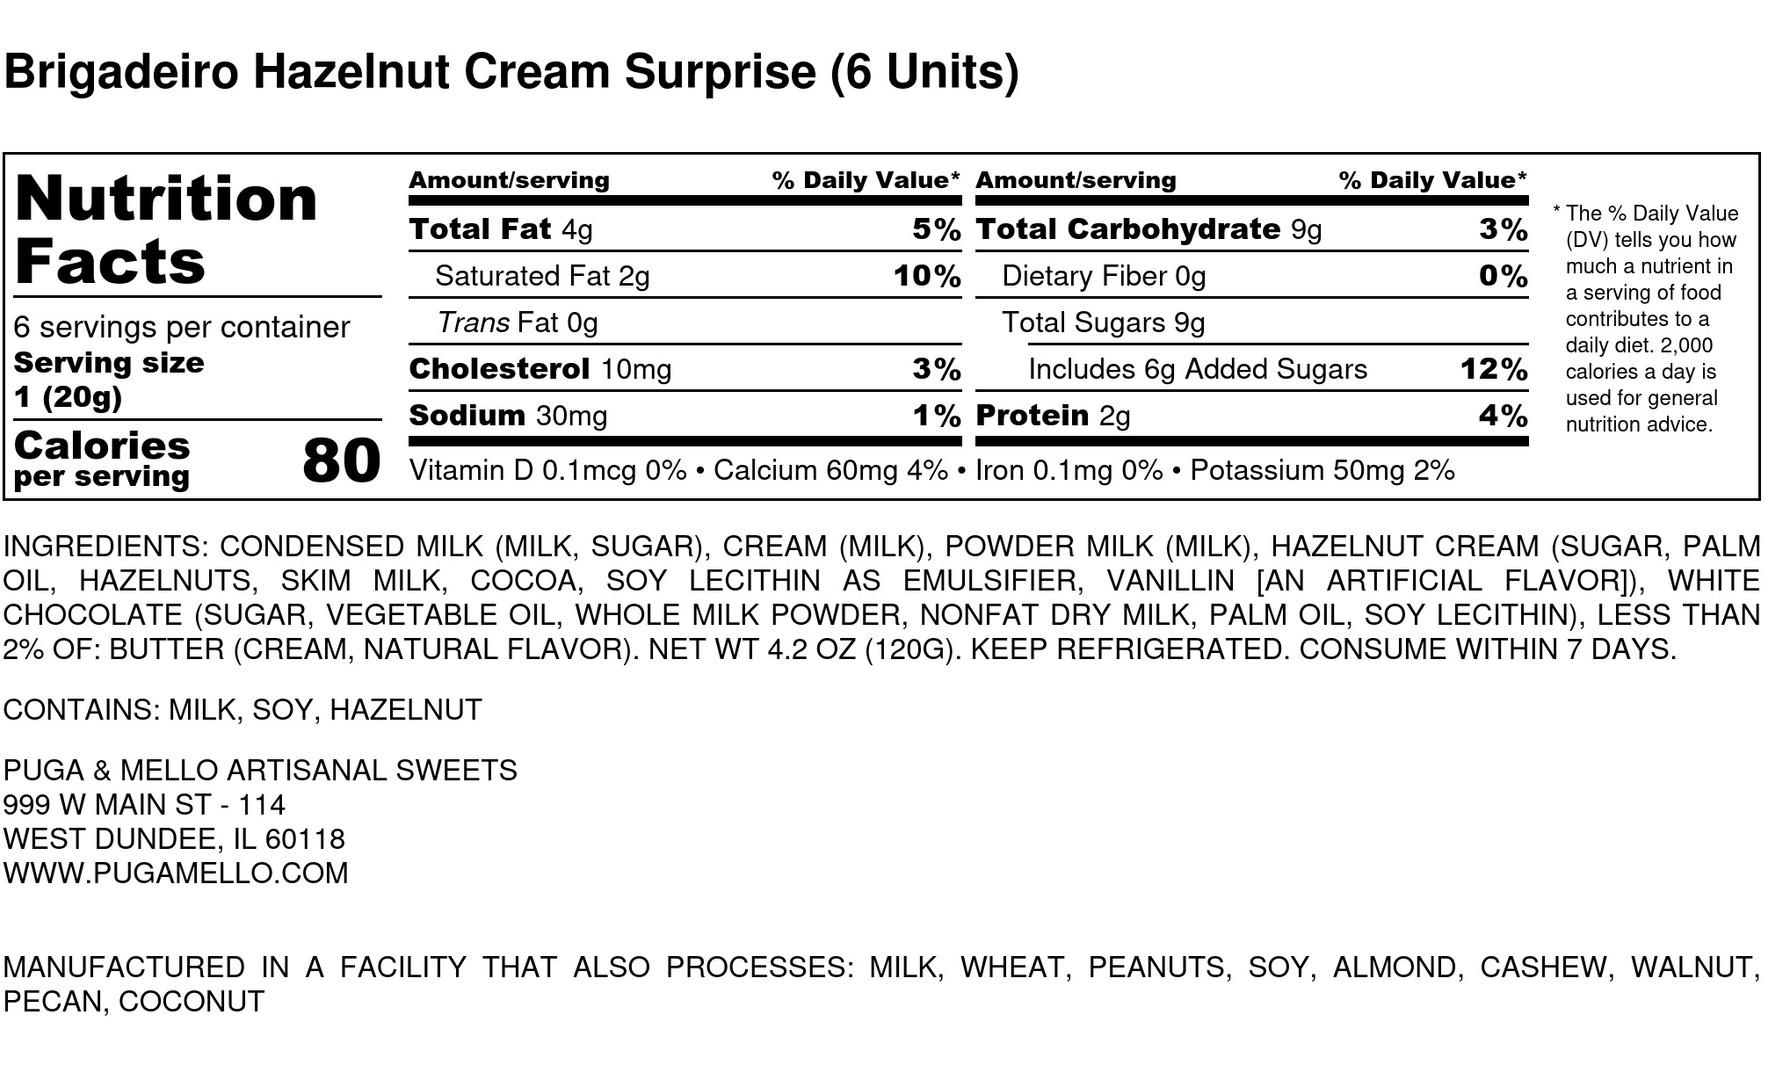 Brigadeiro Hazelnut Cream Surprise (6 Un